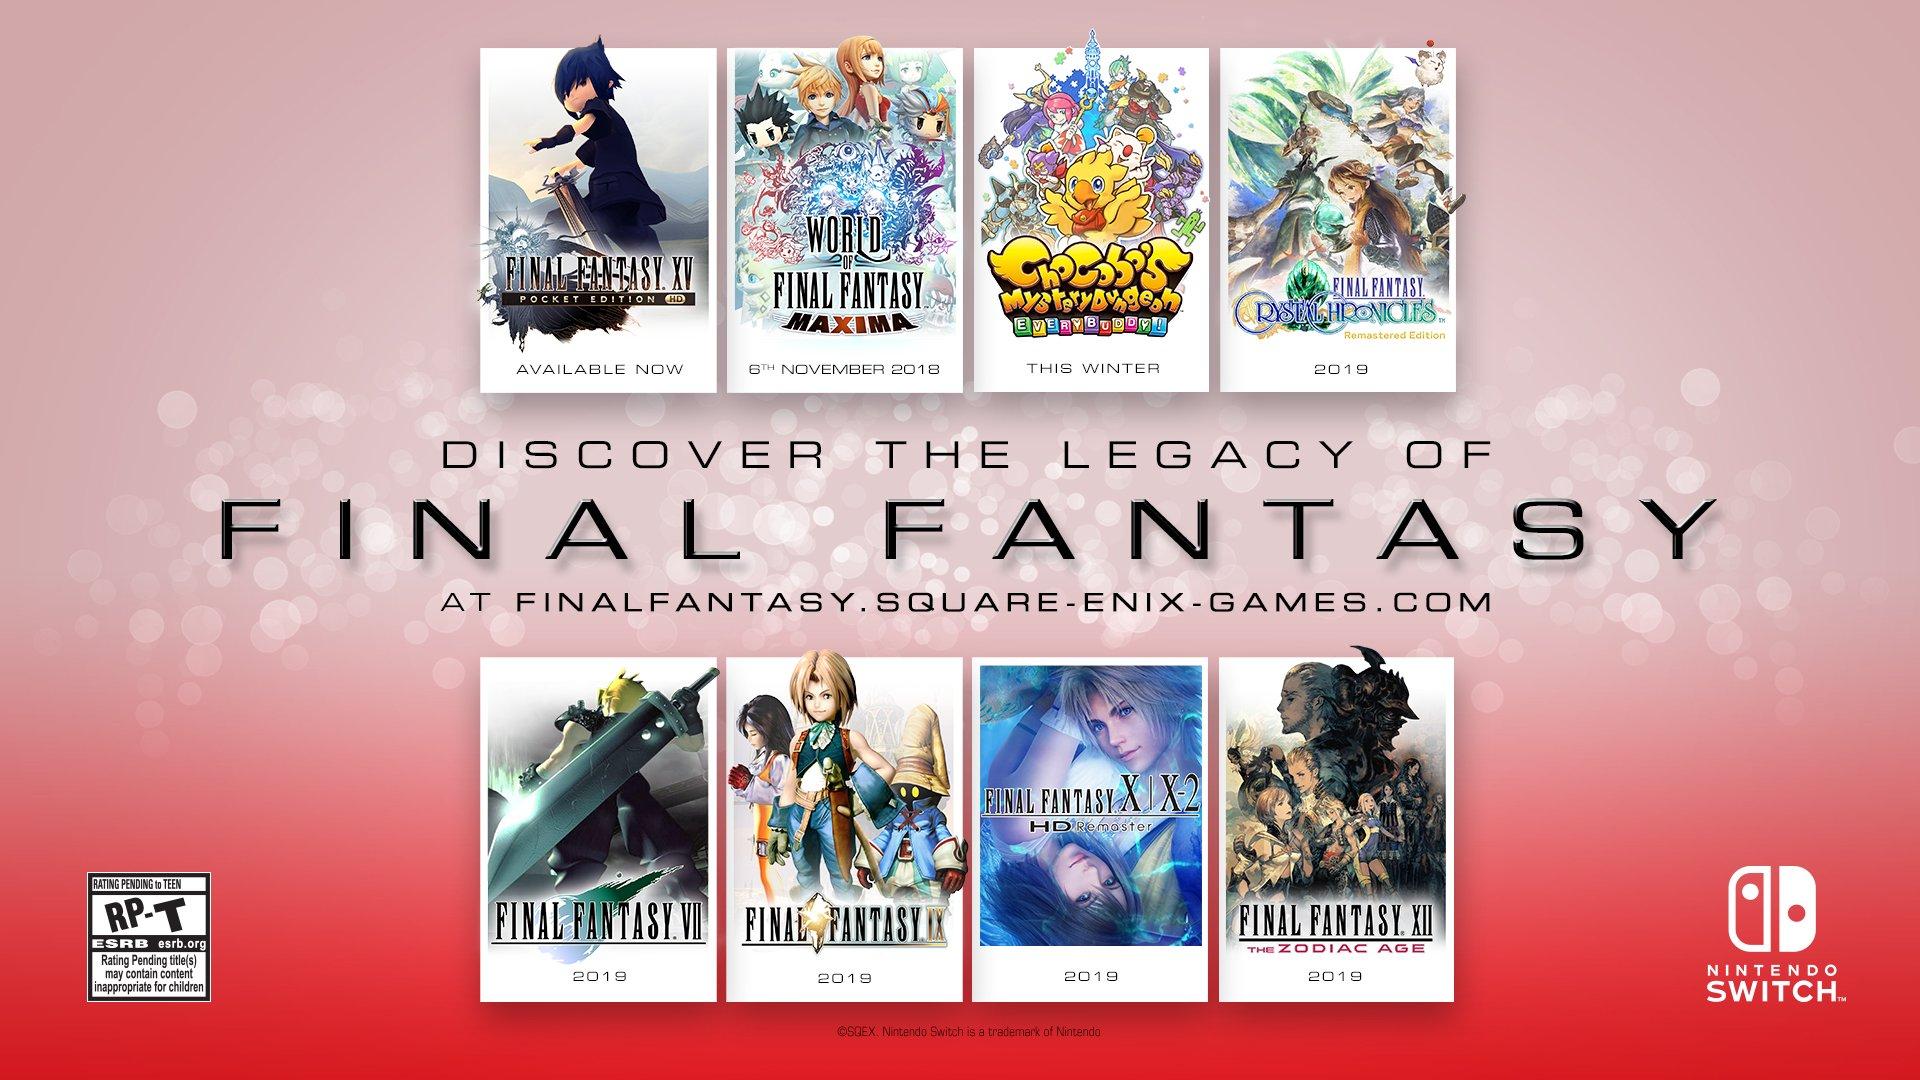 Square Enix ส่งกองทัพเกม Final Fantasy ลง Nintendo Switch !!